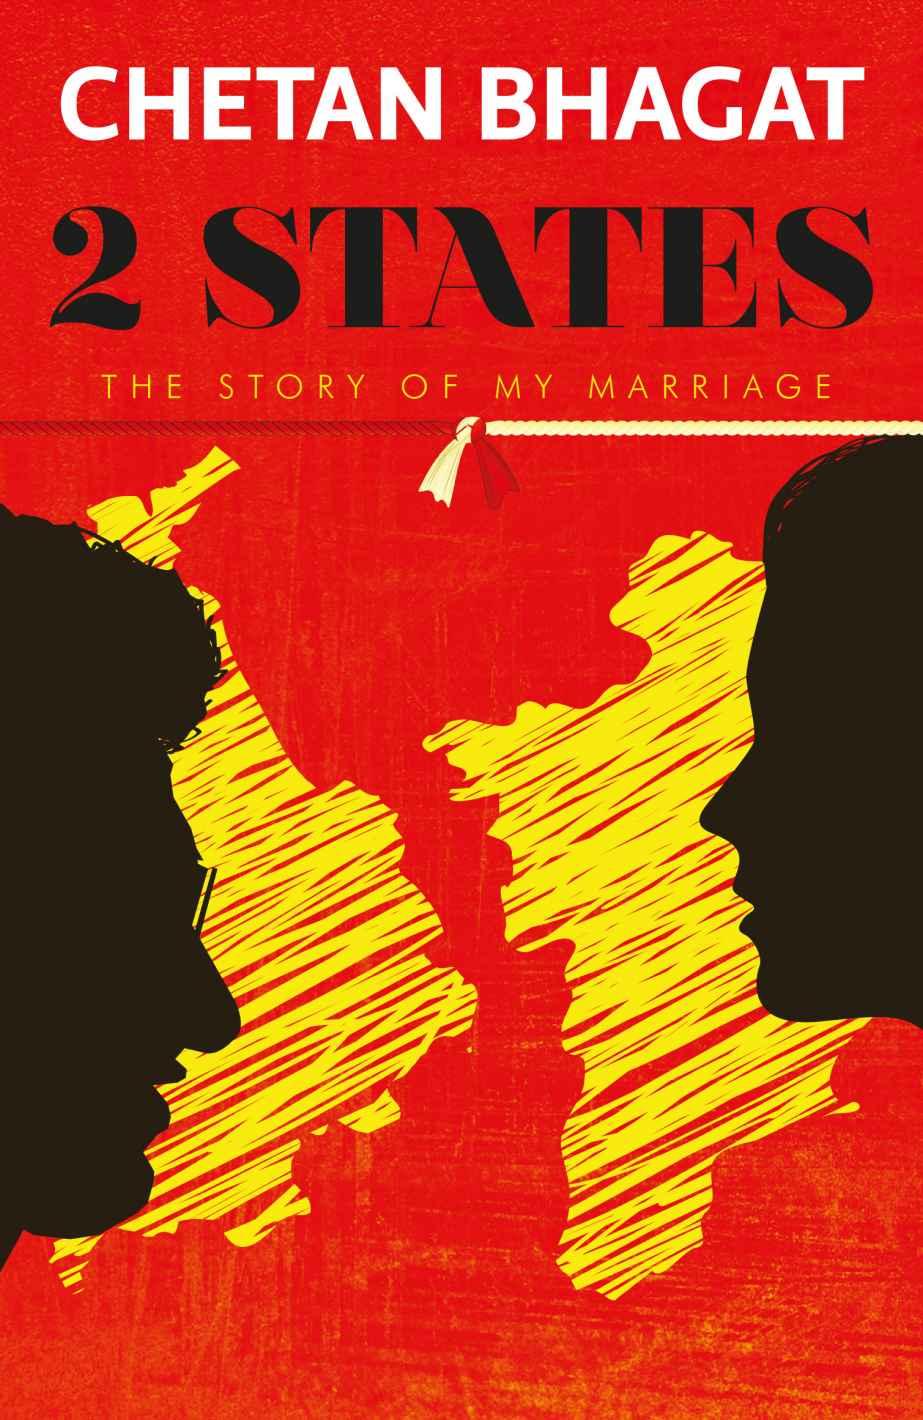 Pdf book 2 states